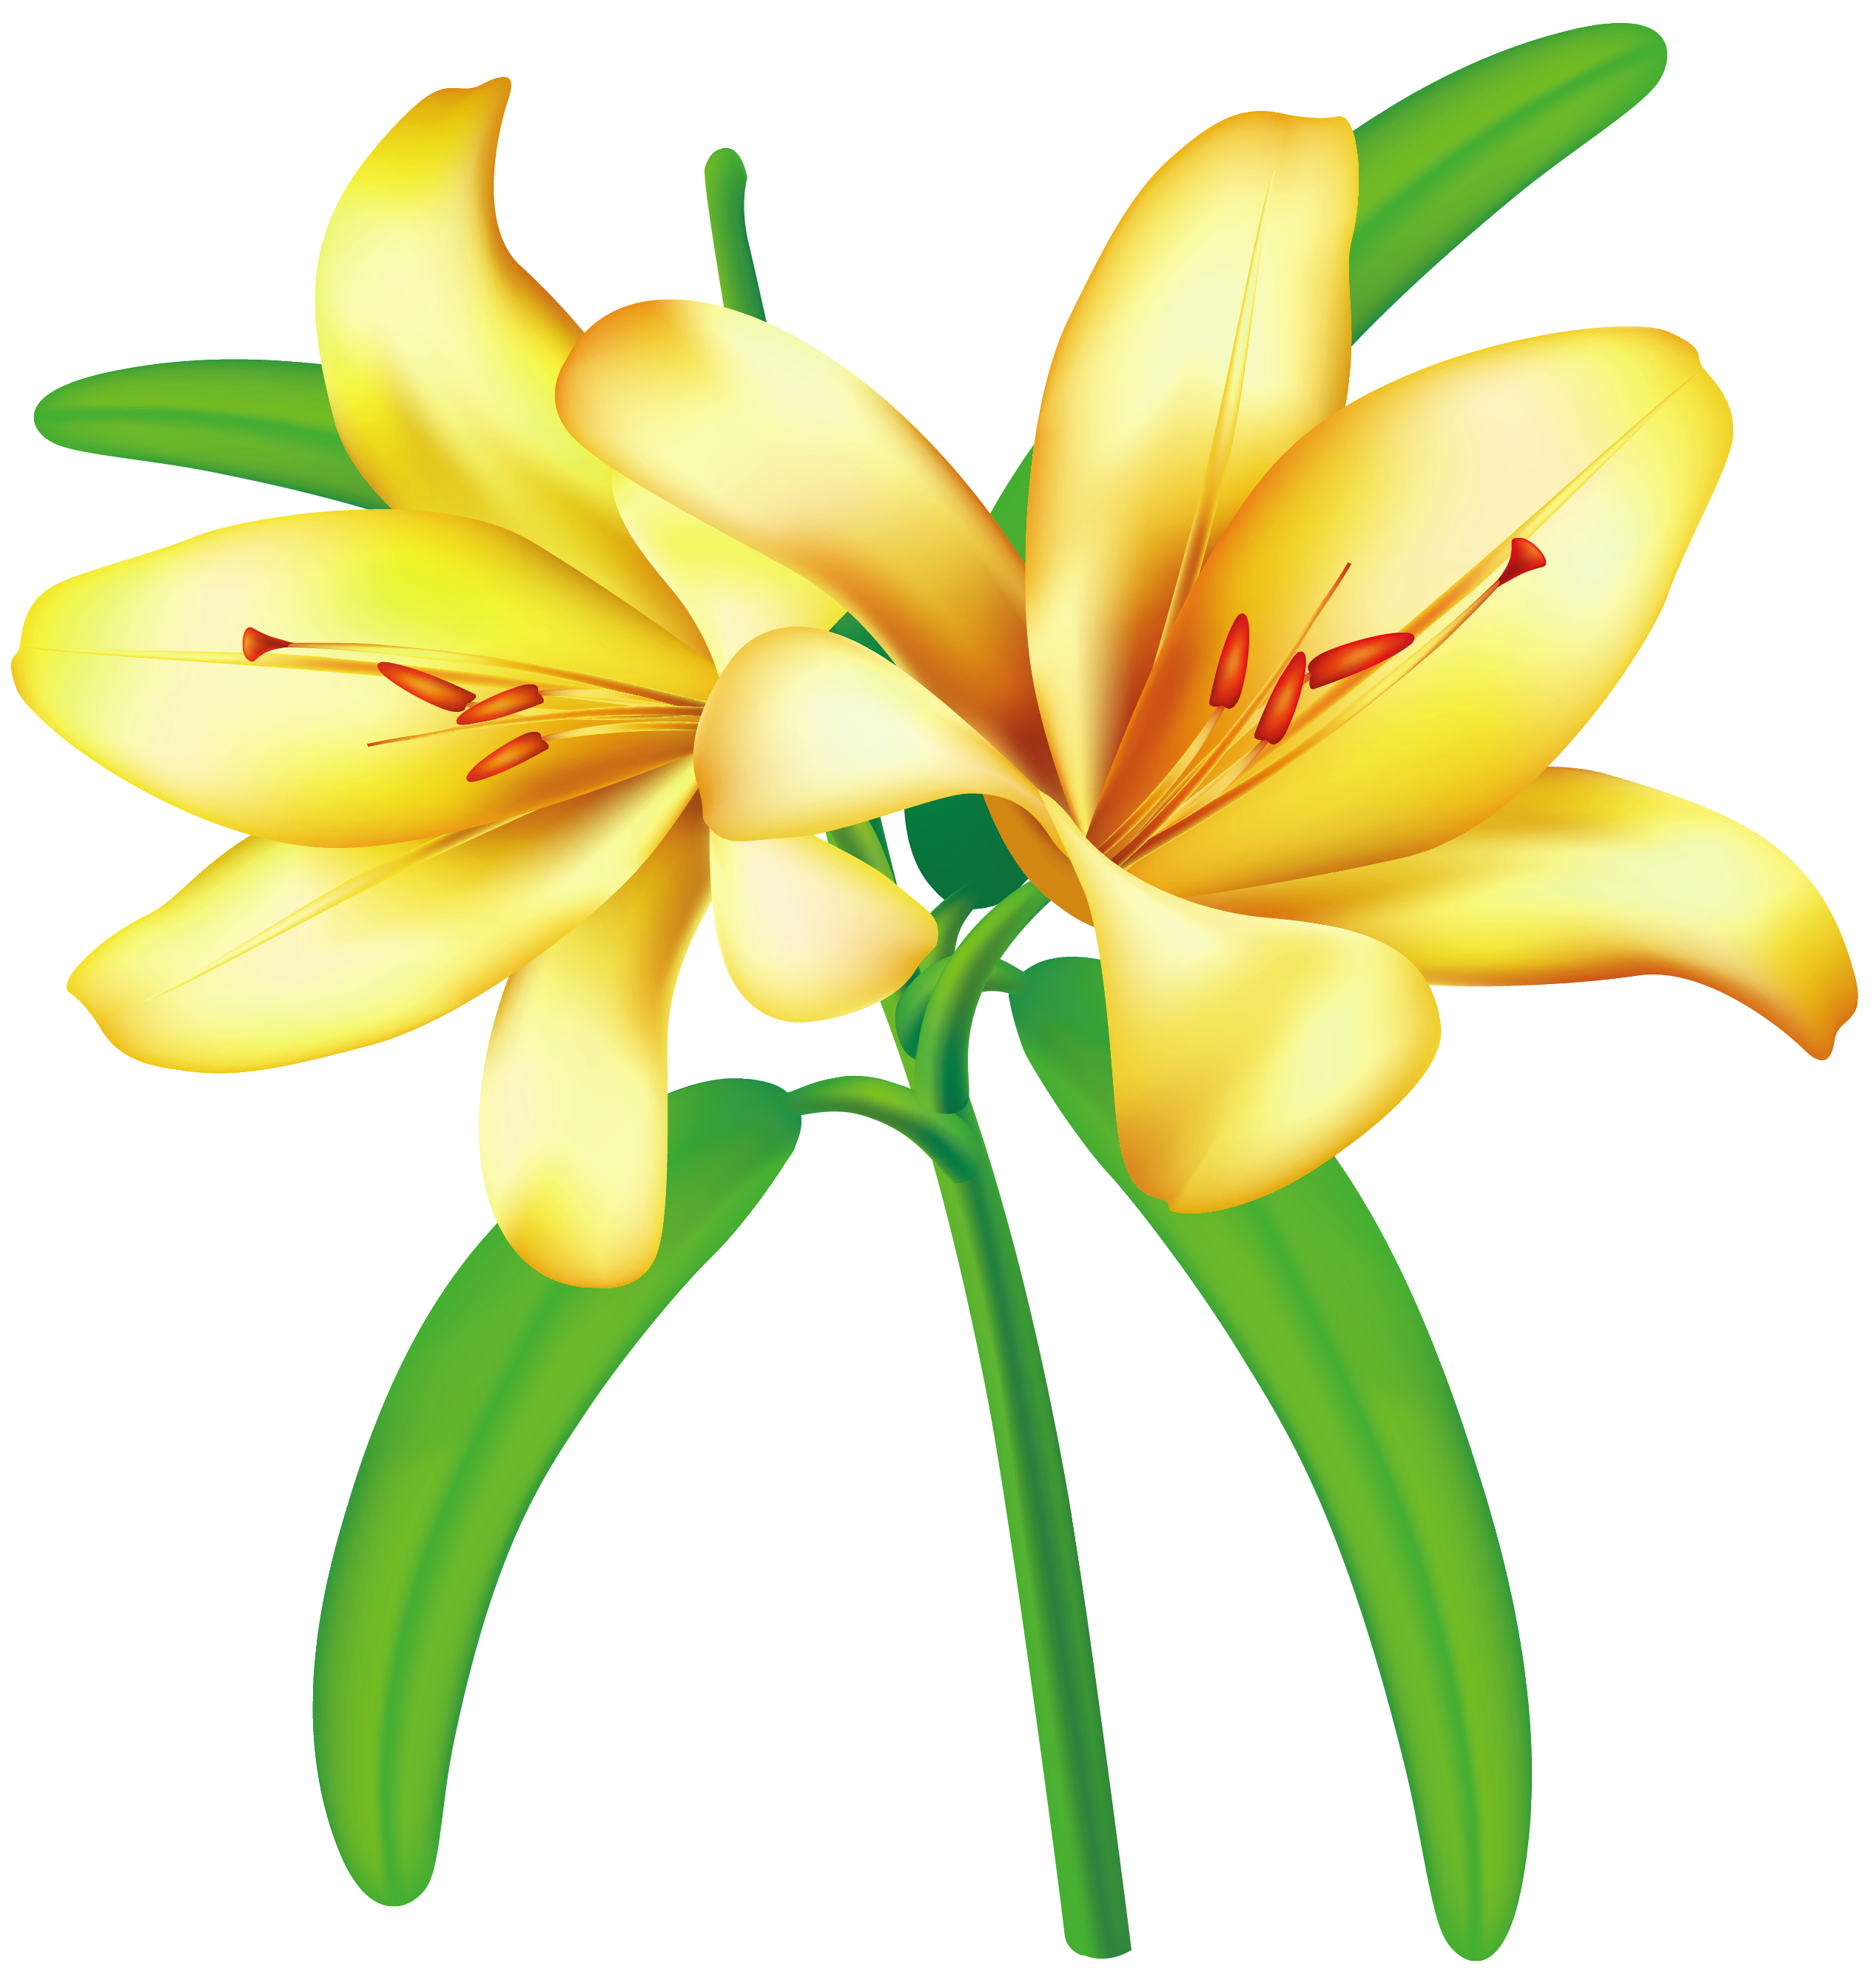 Yellow rose / Flower / Transparent